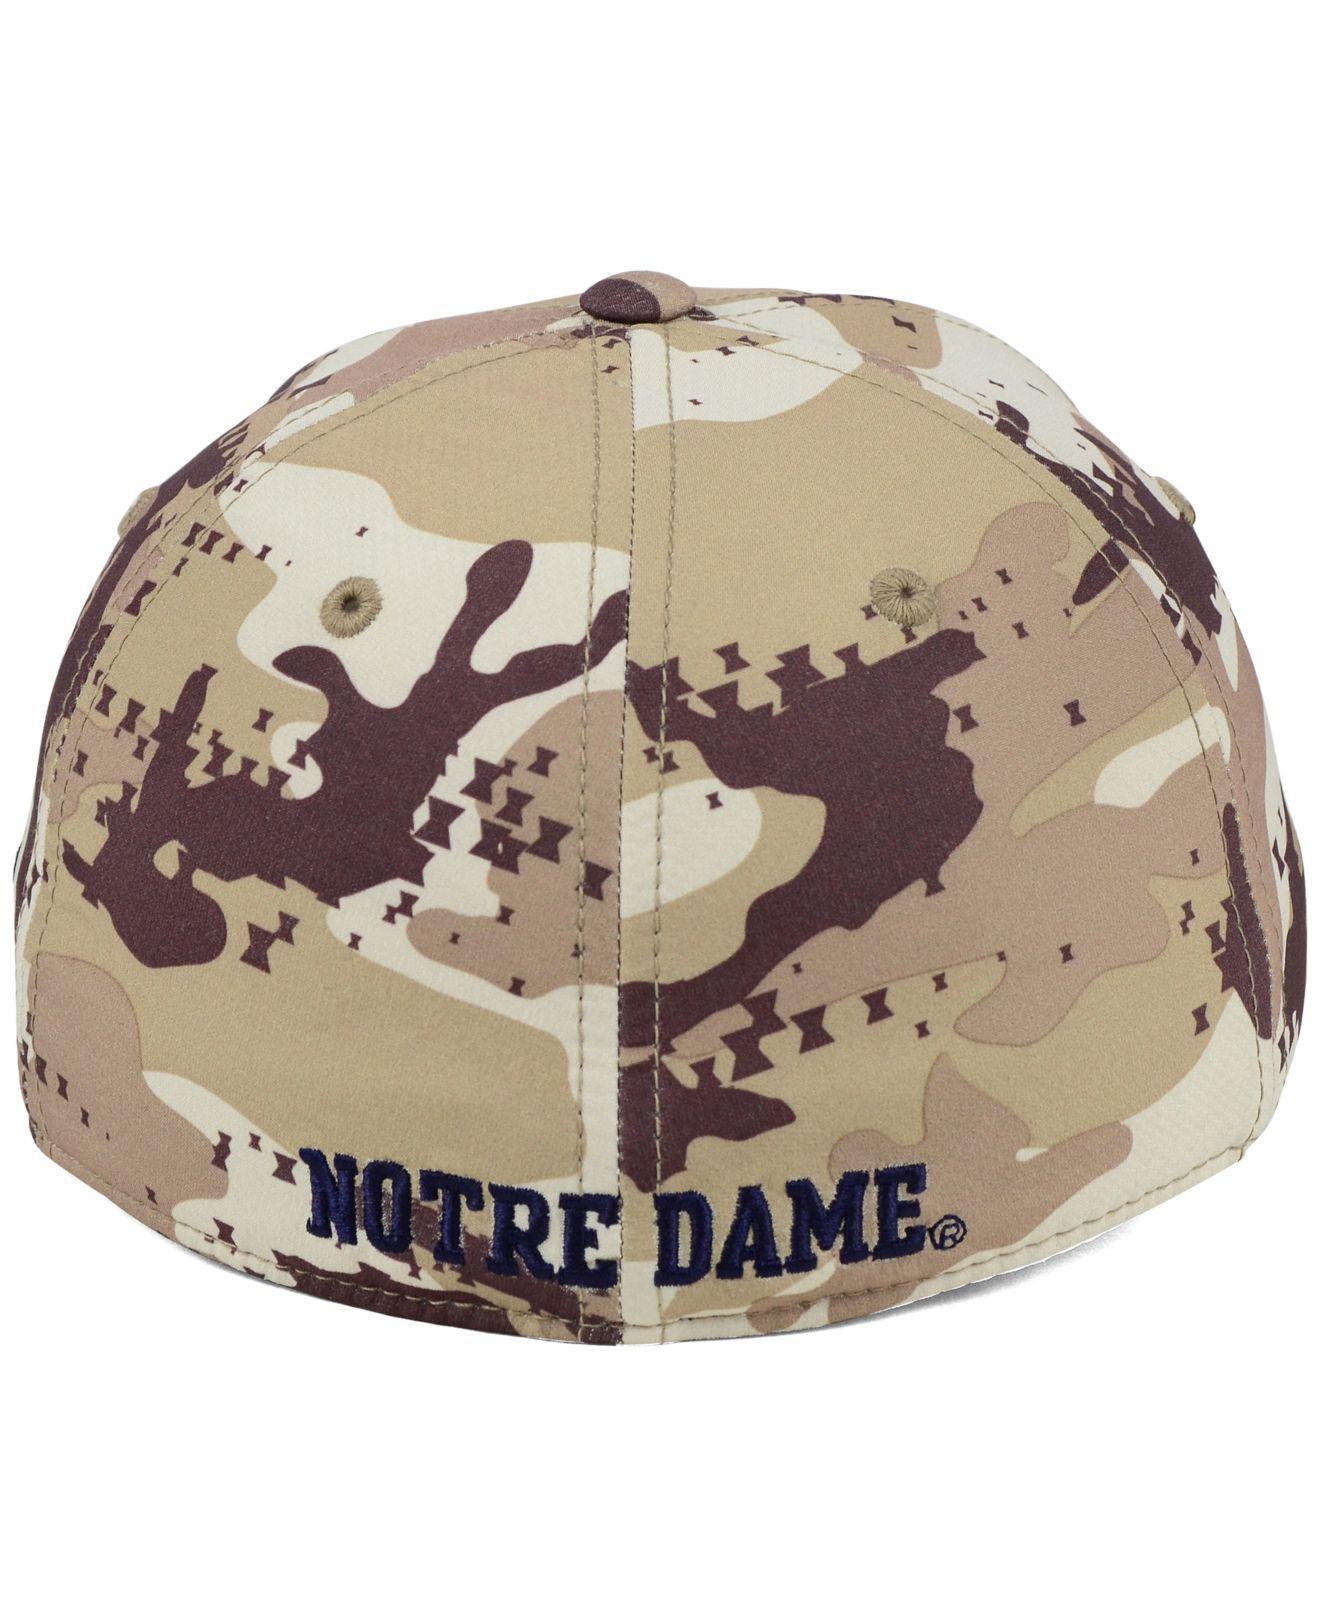 new style 5302b 335b7 clearance notre dame camo baseball hat fighting irish camo baseball etsy  0bb7c 0f067  real notre dame camo hat black afec4 adc42